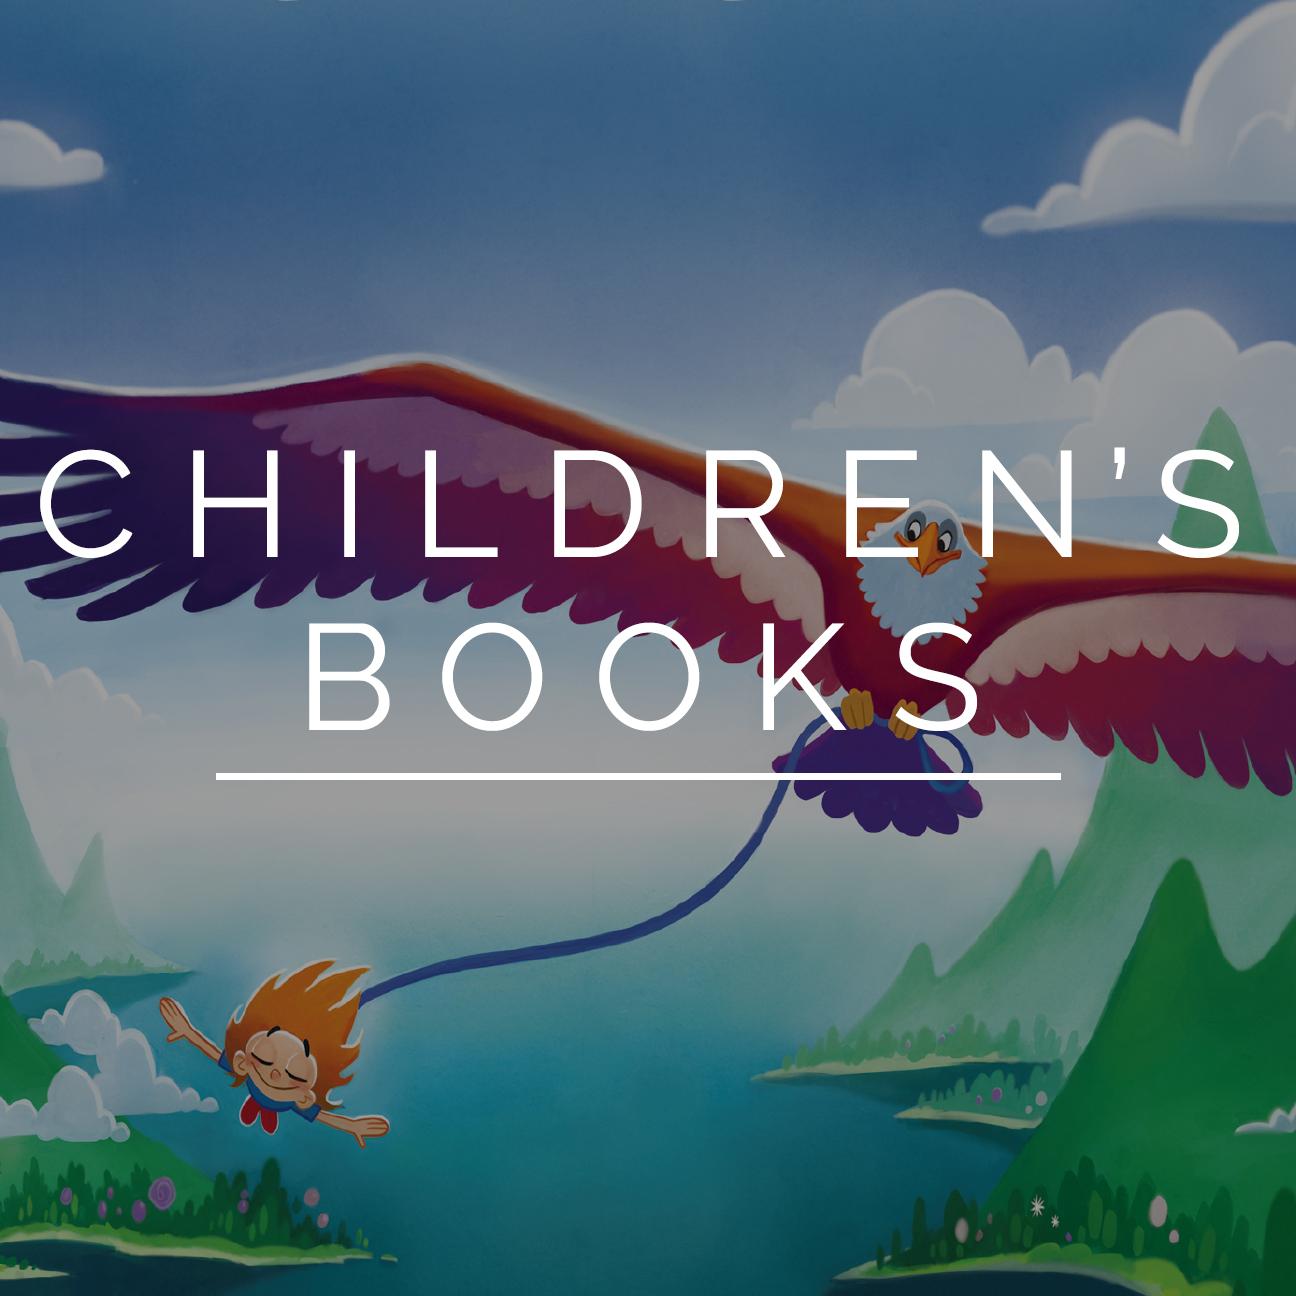 kidsbooks.jpg